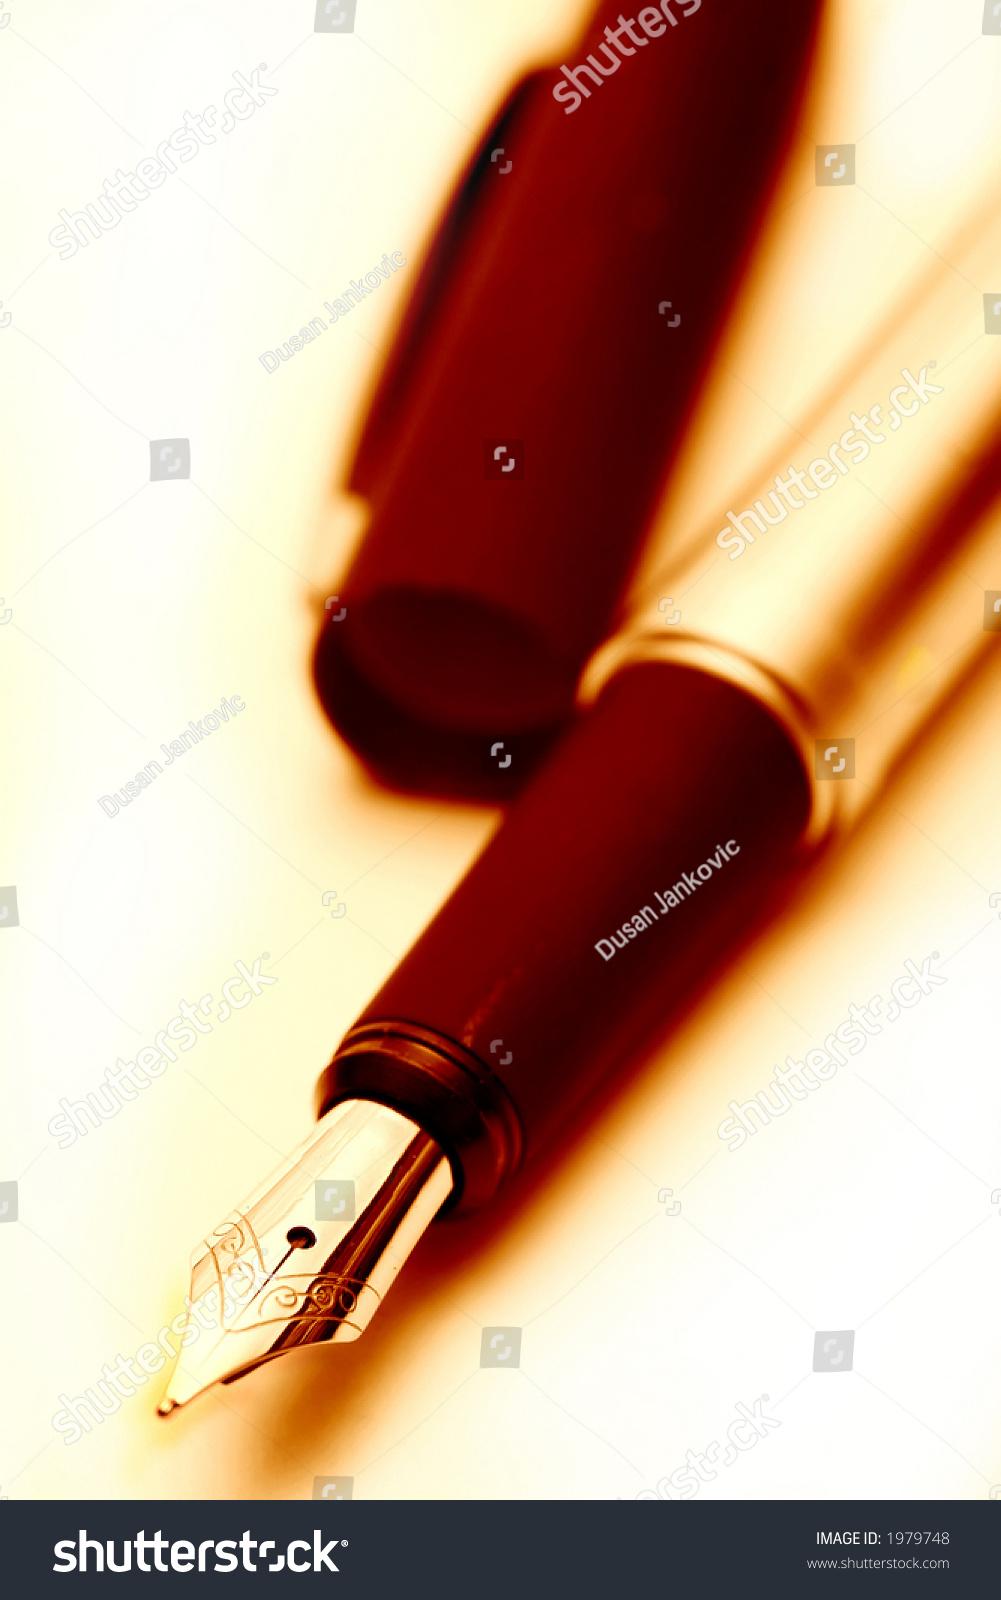 Old Fashioned Pen Oldfashioned Fou...